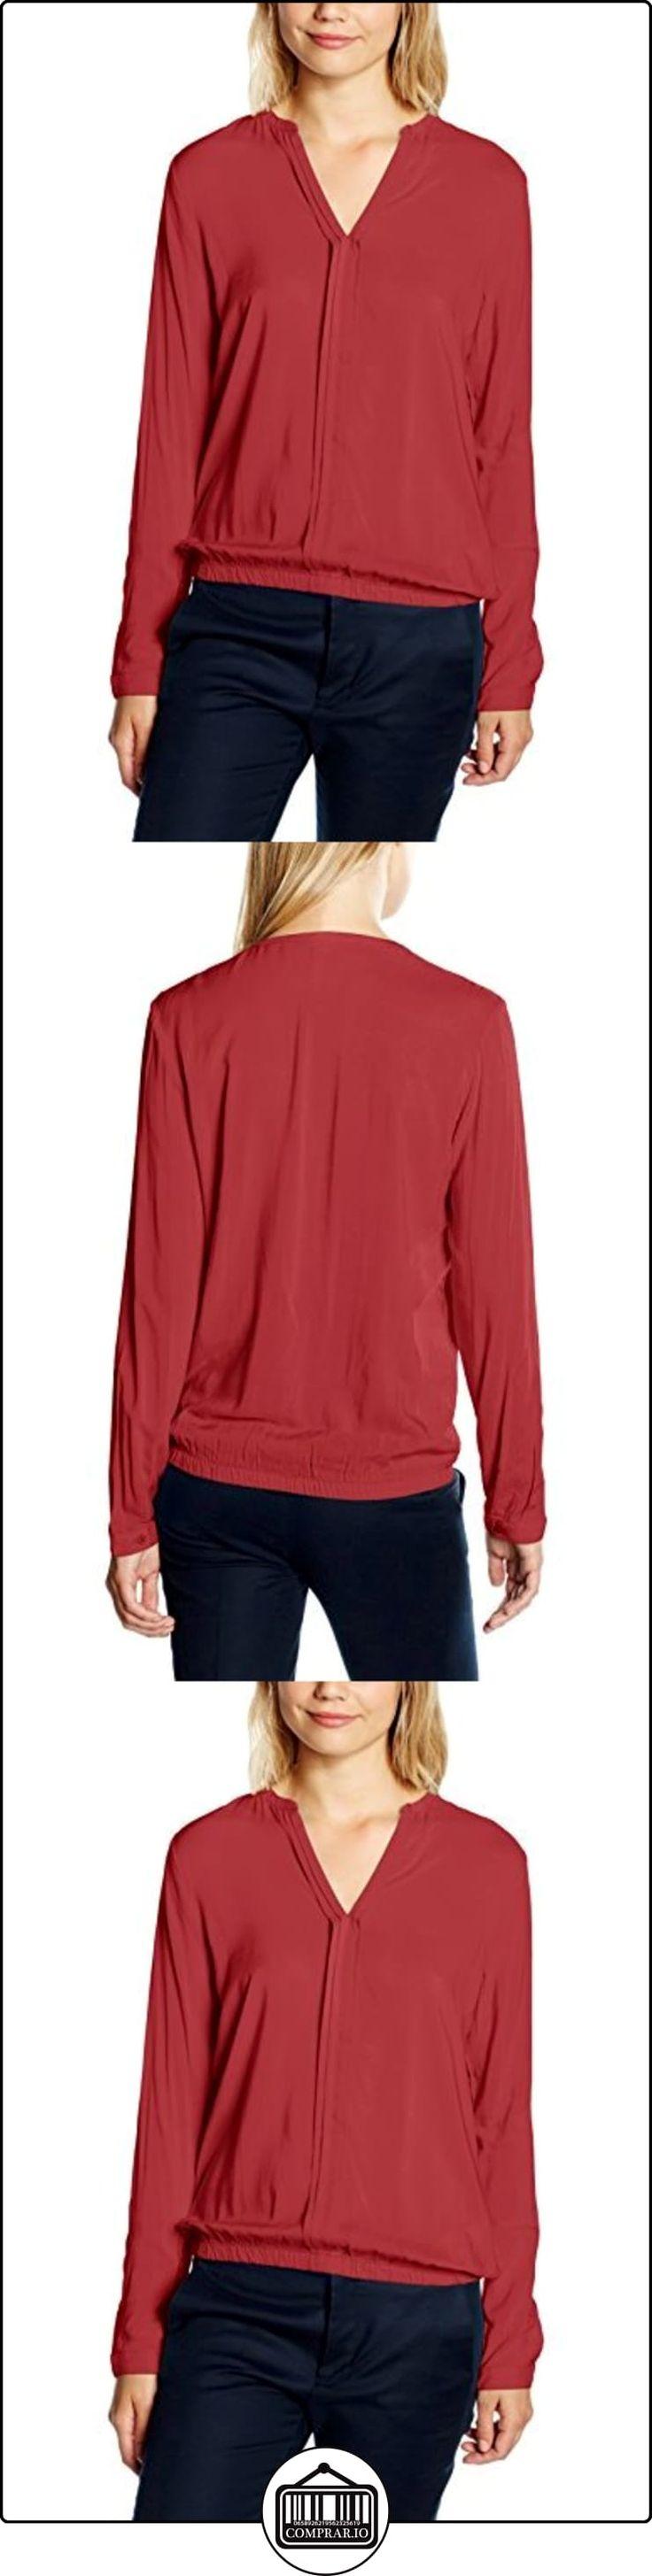 s.Oliver Denim Mit Smokbündchen, Blusa para Mujer, Rot (Brick Red 2837), 38  ✿ Blusas y camisas ✿